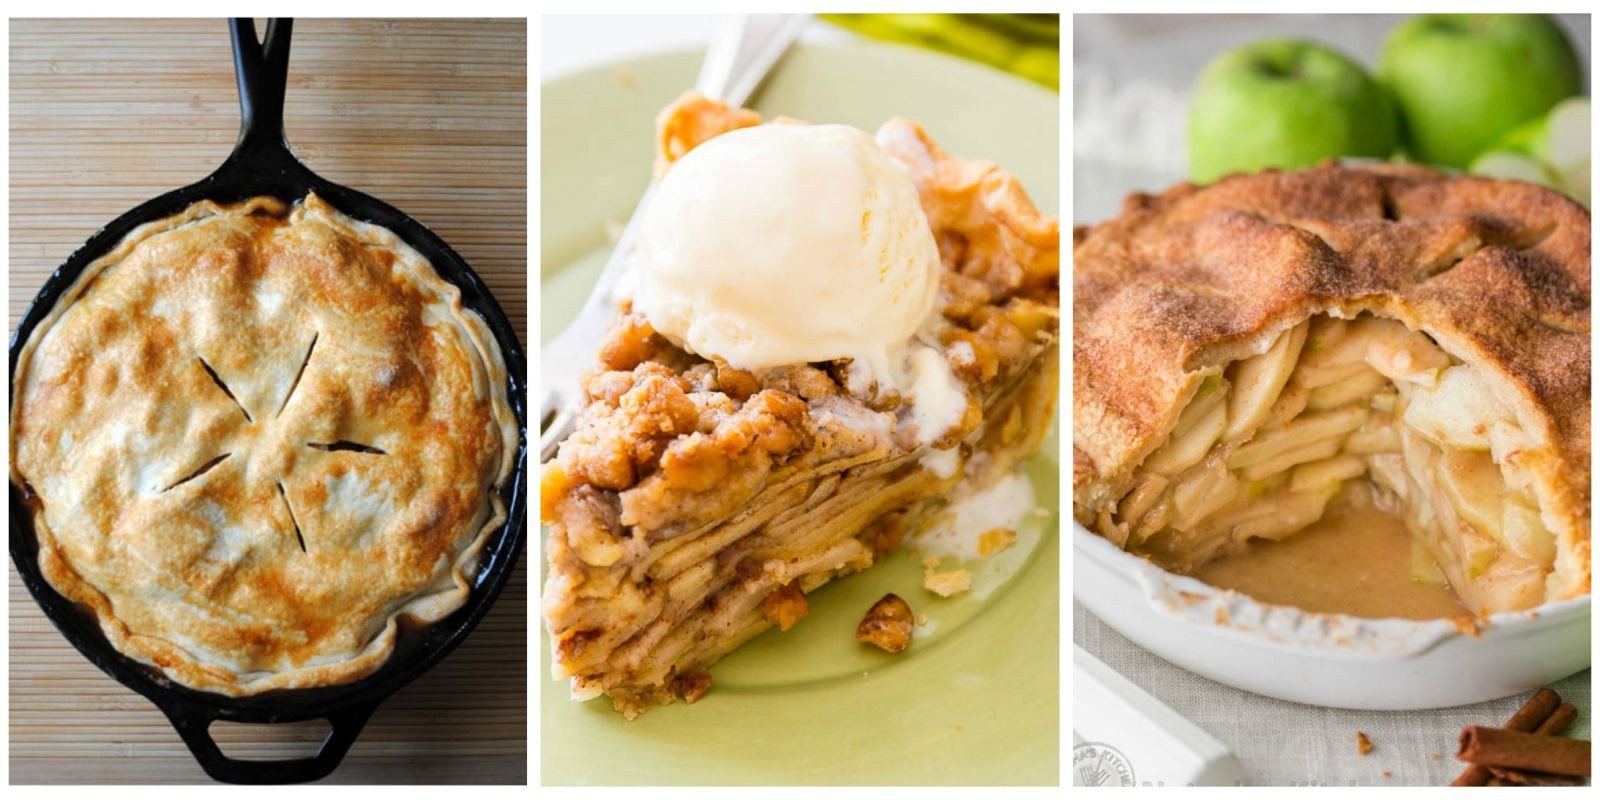 Best Apple Pie  35 Best Apple Pie Recipes How to Make Homemade Apple Pie